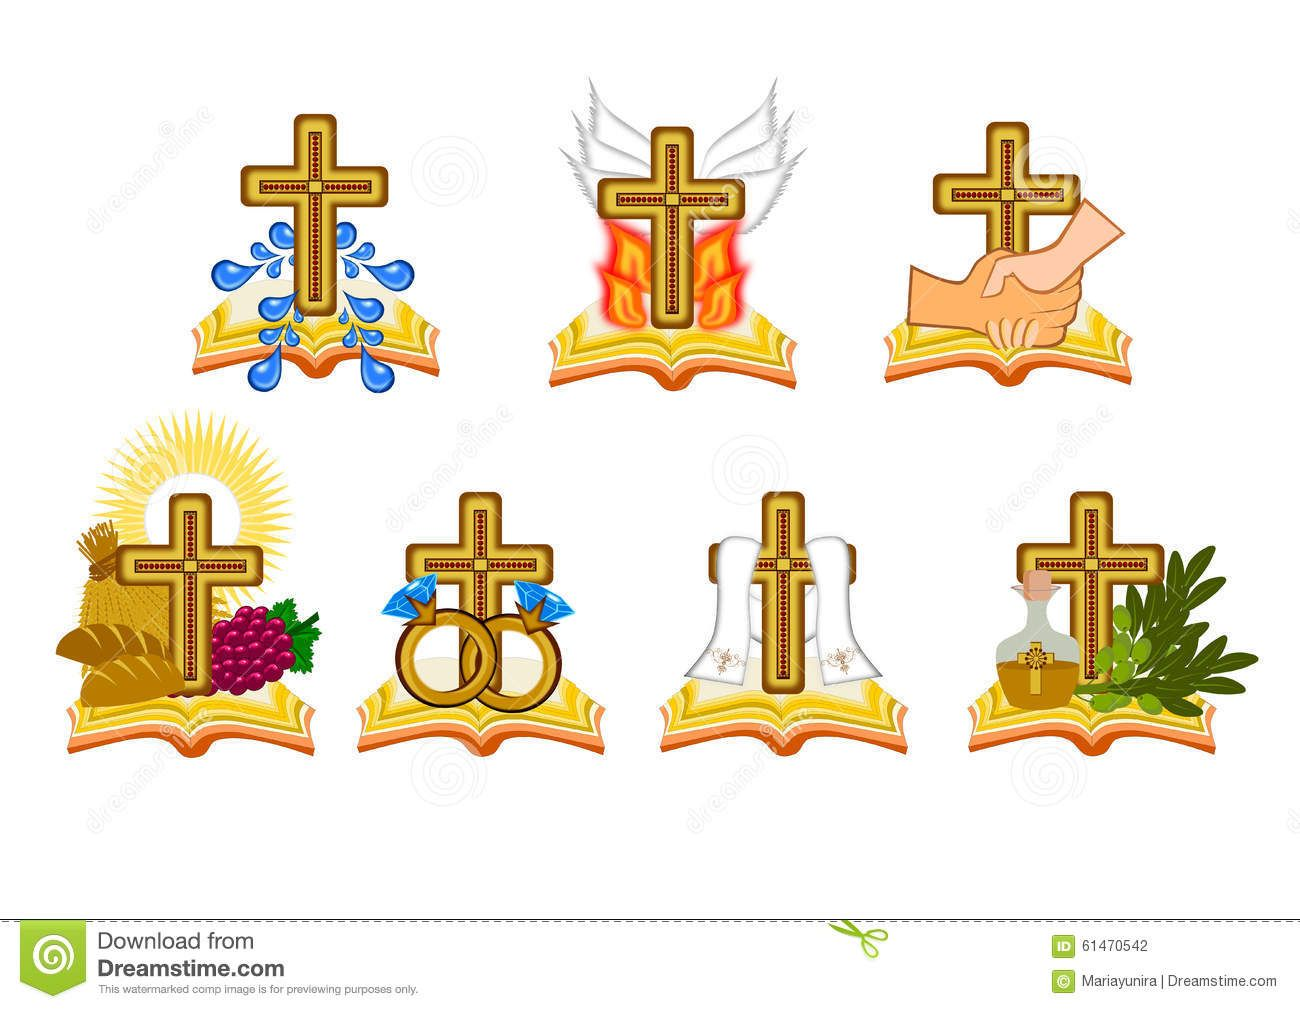 los siete sacramentos - Szukaj w Google | SAKRAMENTY | Pinterest ...